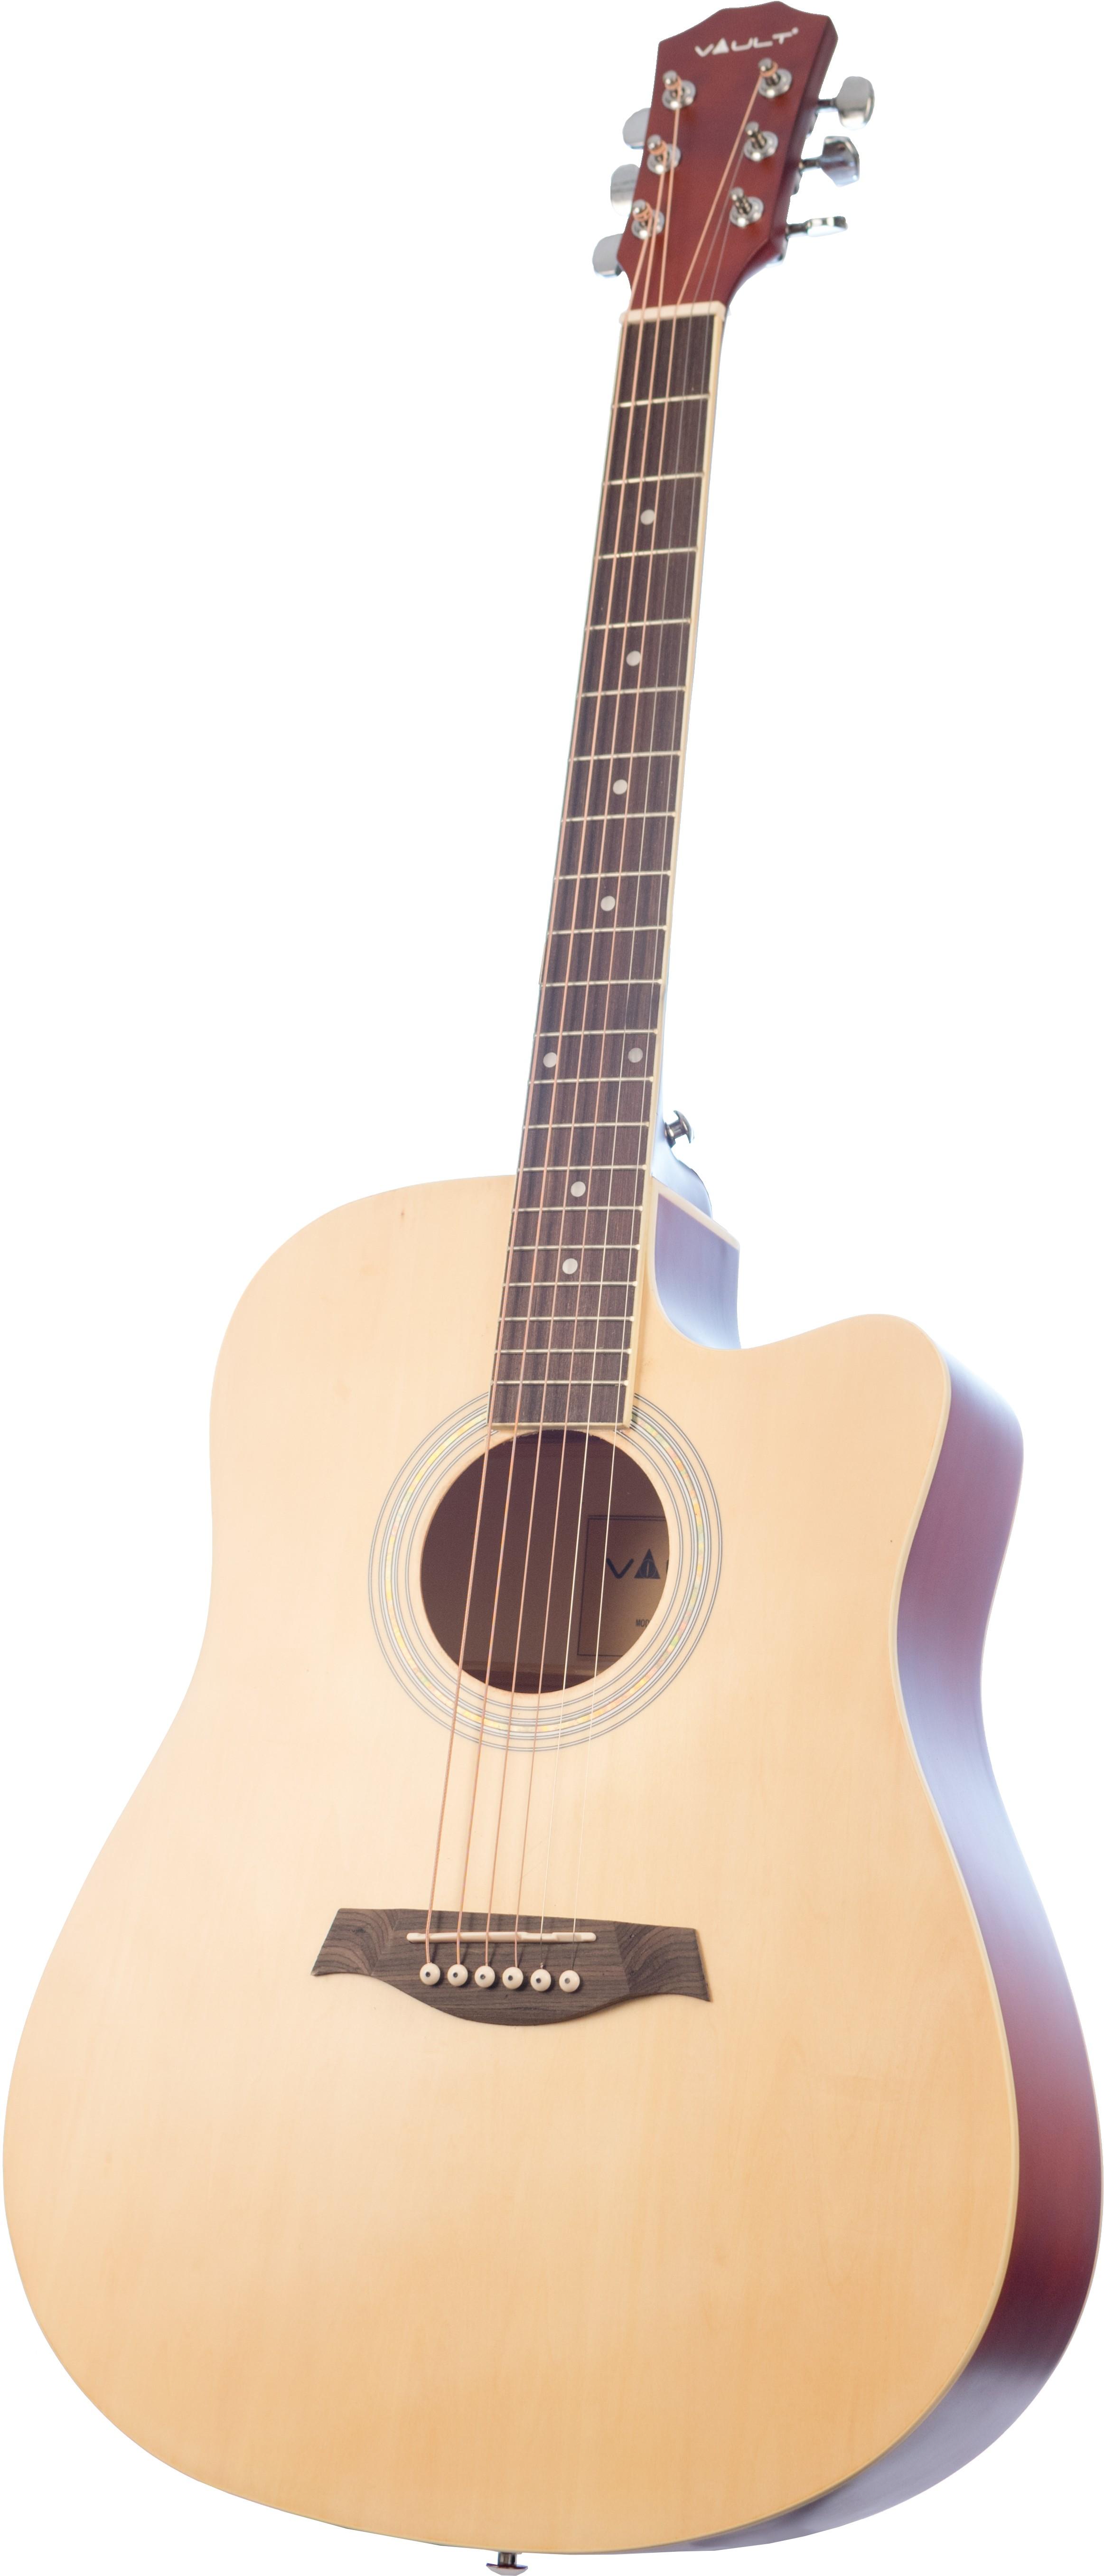 Vault 41-Inch Cutaway Acoustic Guitar - Natural Natural Natural 2b0617